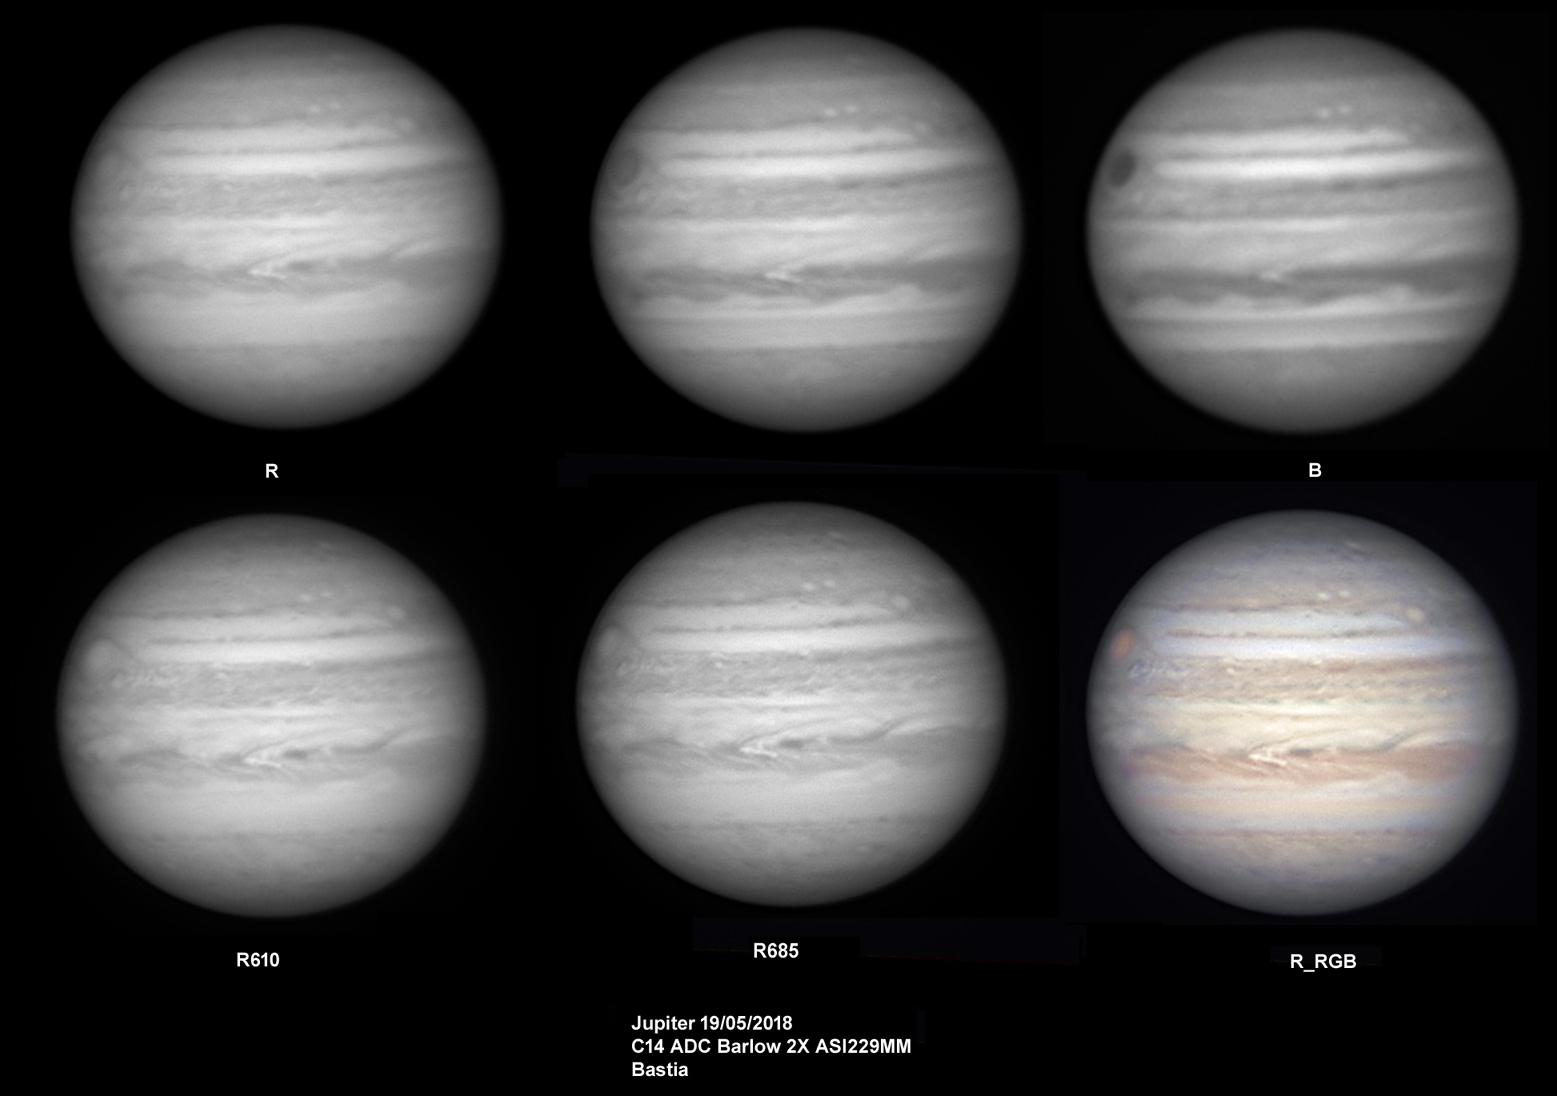 Planche1-Jupiter-19_05_2018.jpg